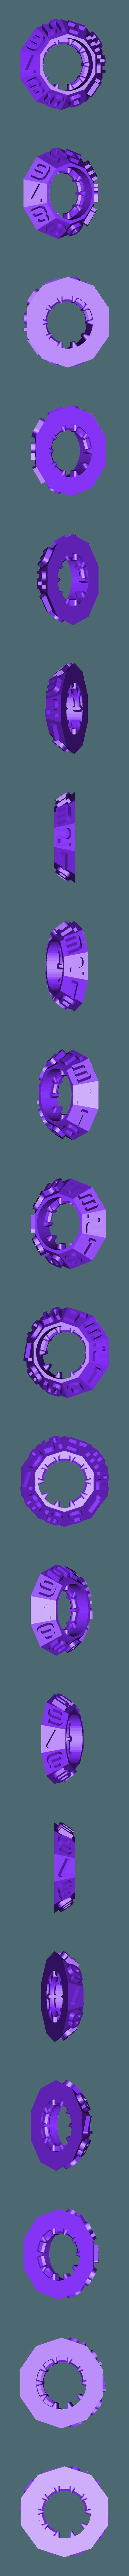 3R-4L.stl Download free STL file Latch Cryptex - Cerrojo • 3D printable design, xutano